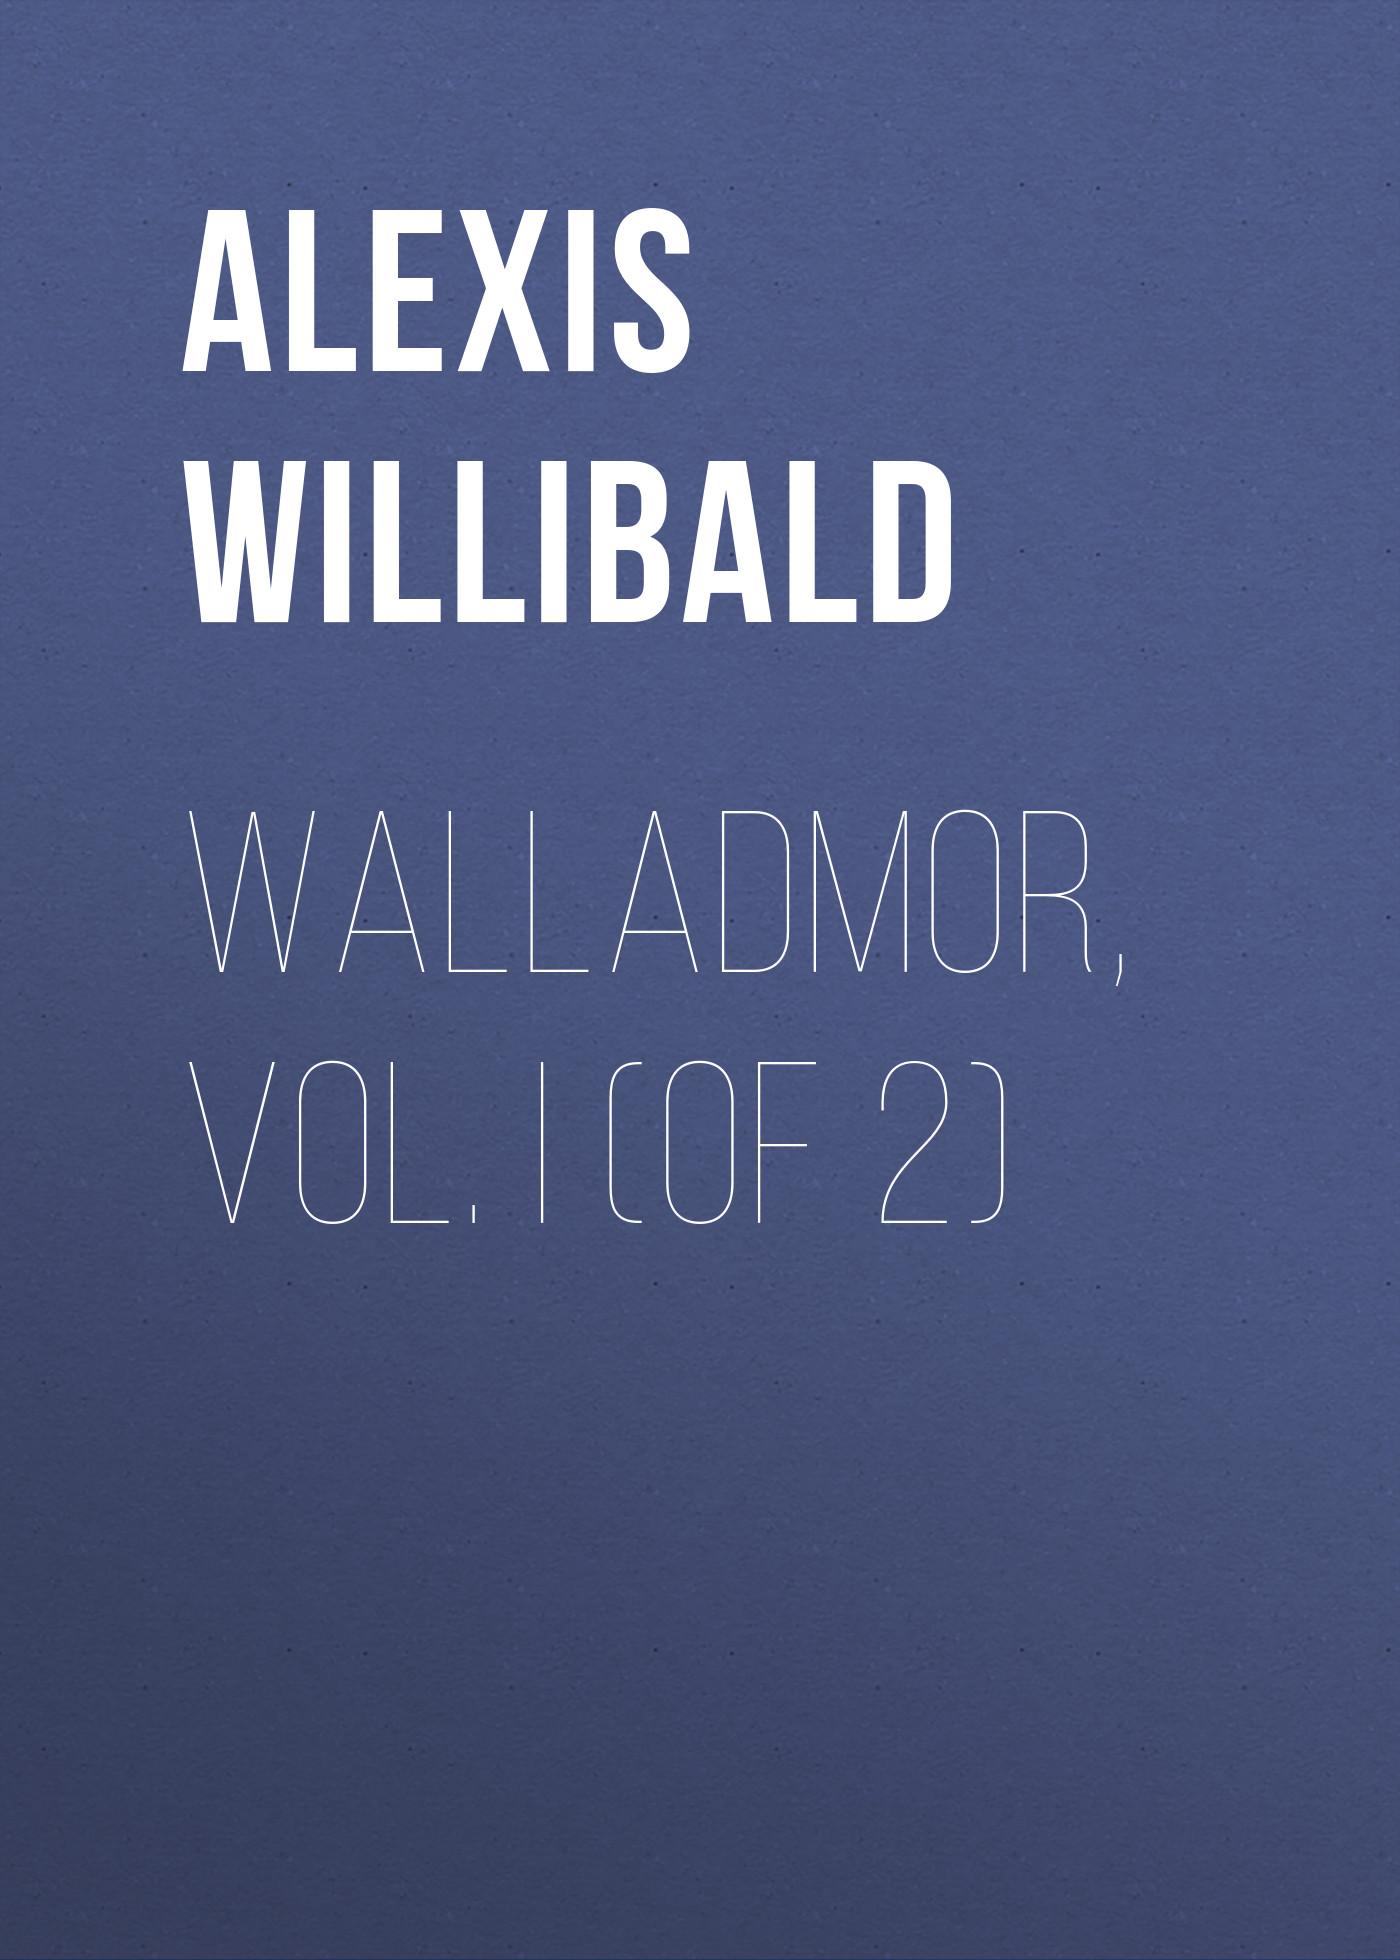 Alexis Willibald Walladmor, Vol. I (of 2) стоимость